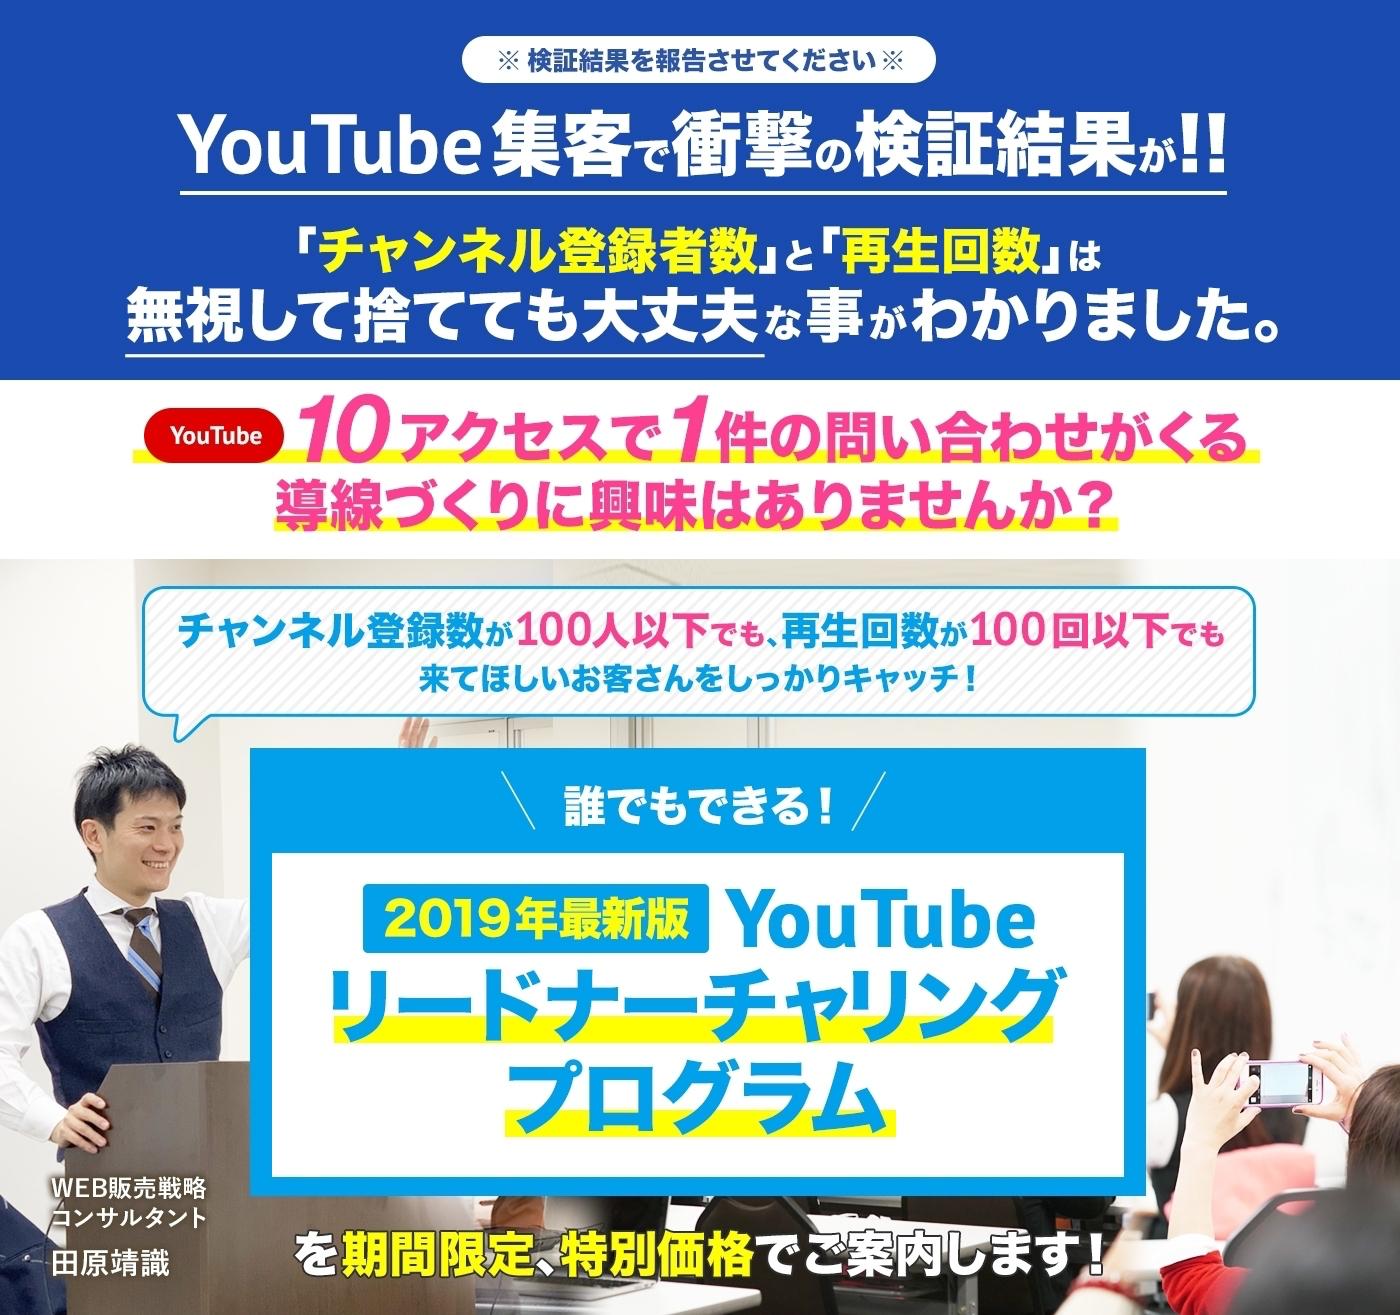 YouTube戦略の検証結果を手に入れる